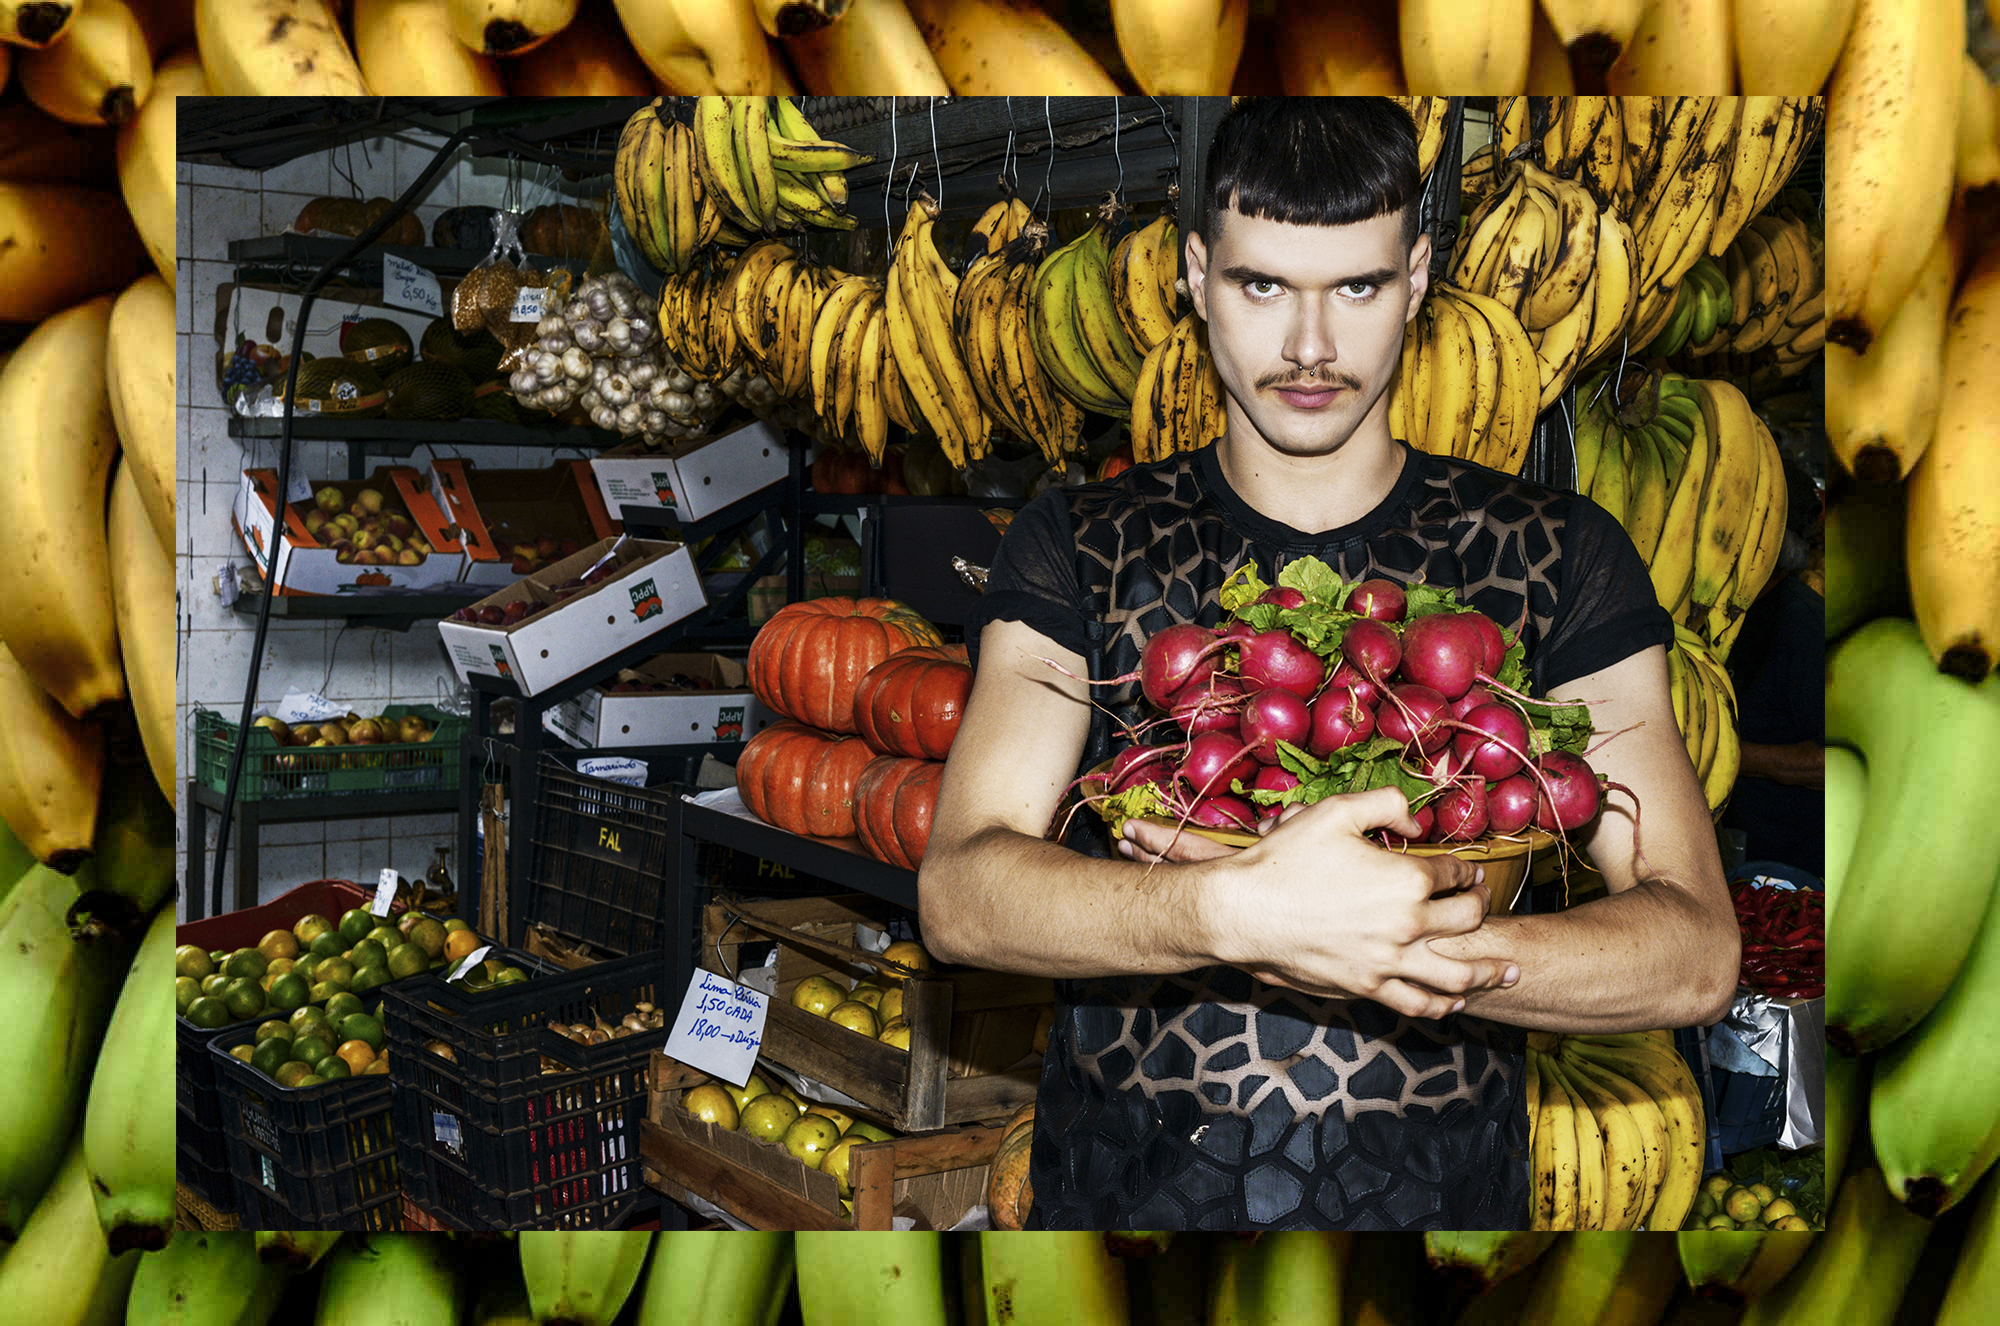 editorial de moda, moda masculina, moda sem censura, alex cursino, rodrigo marconatto, arnaldo dalmiglio, dicas de moda, magazine, shooting 2017 (9)